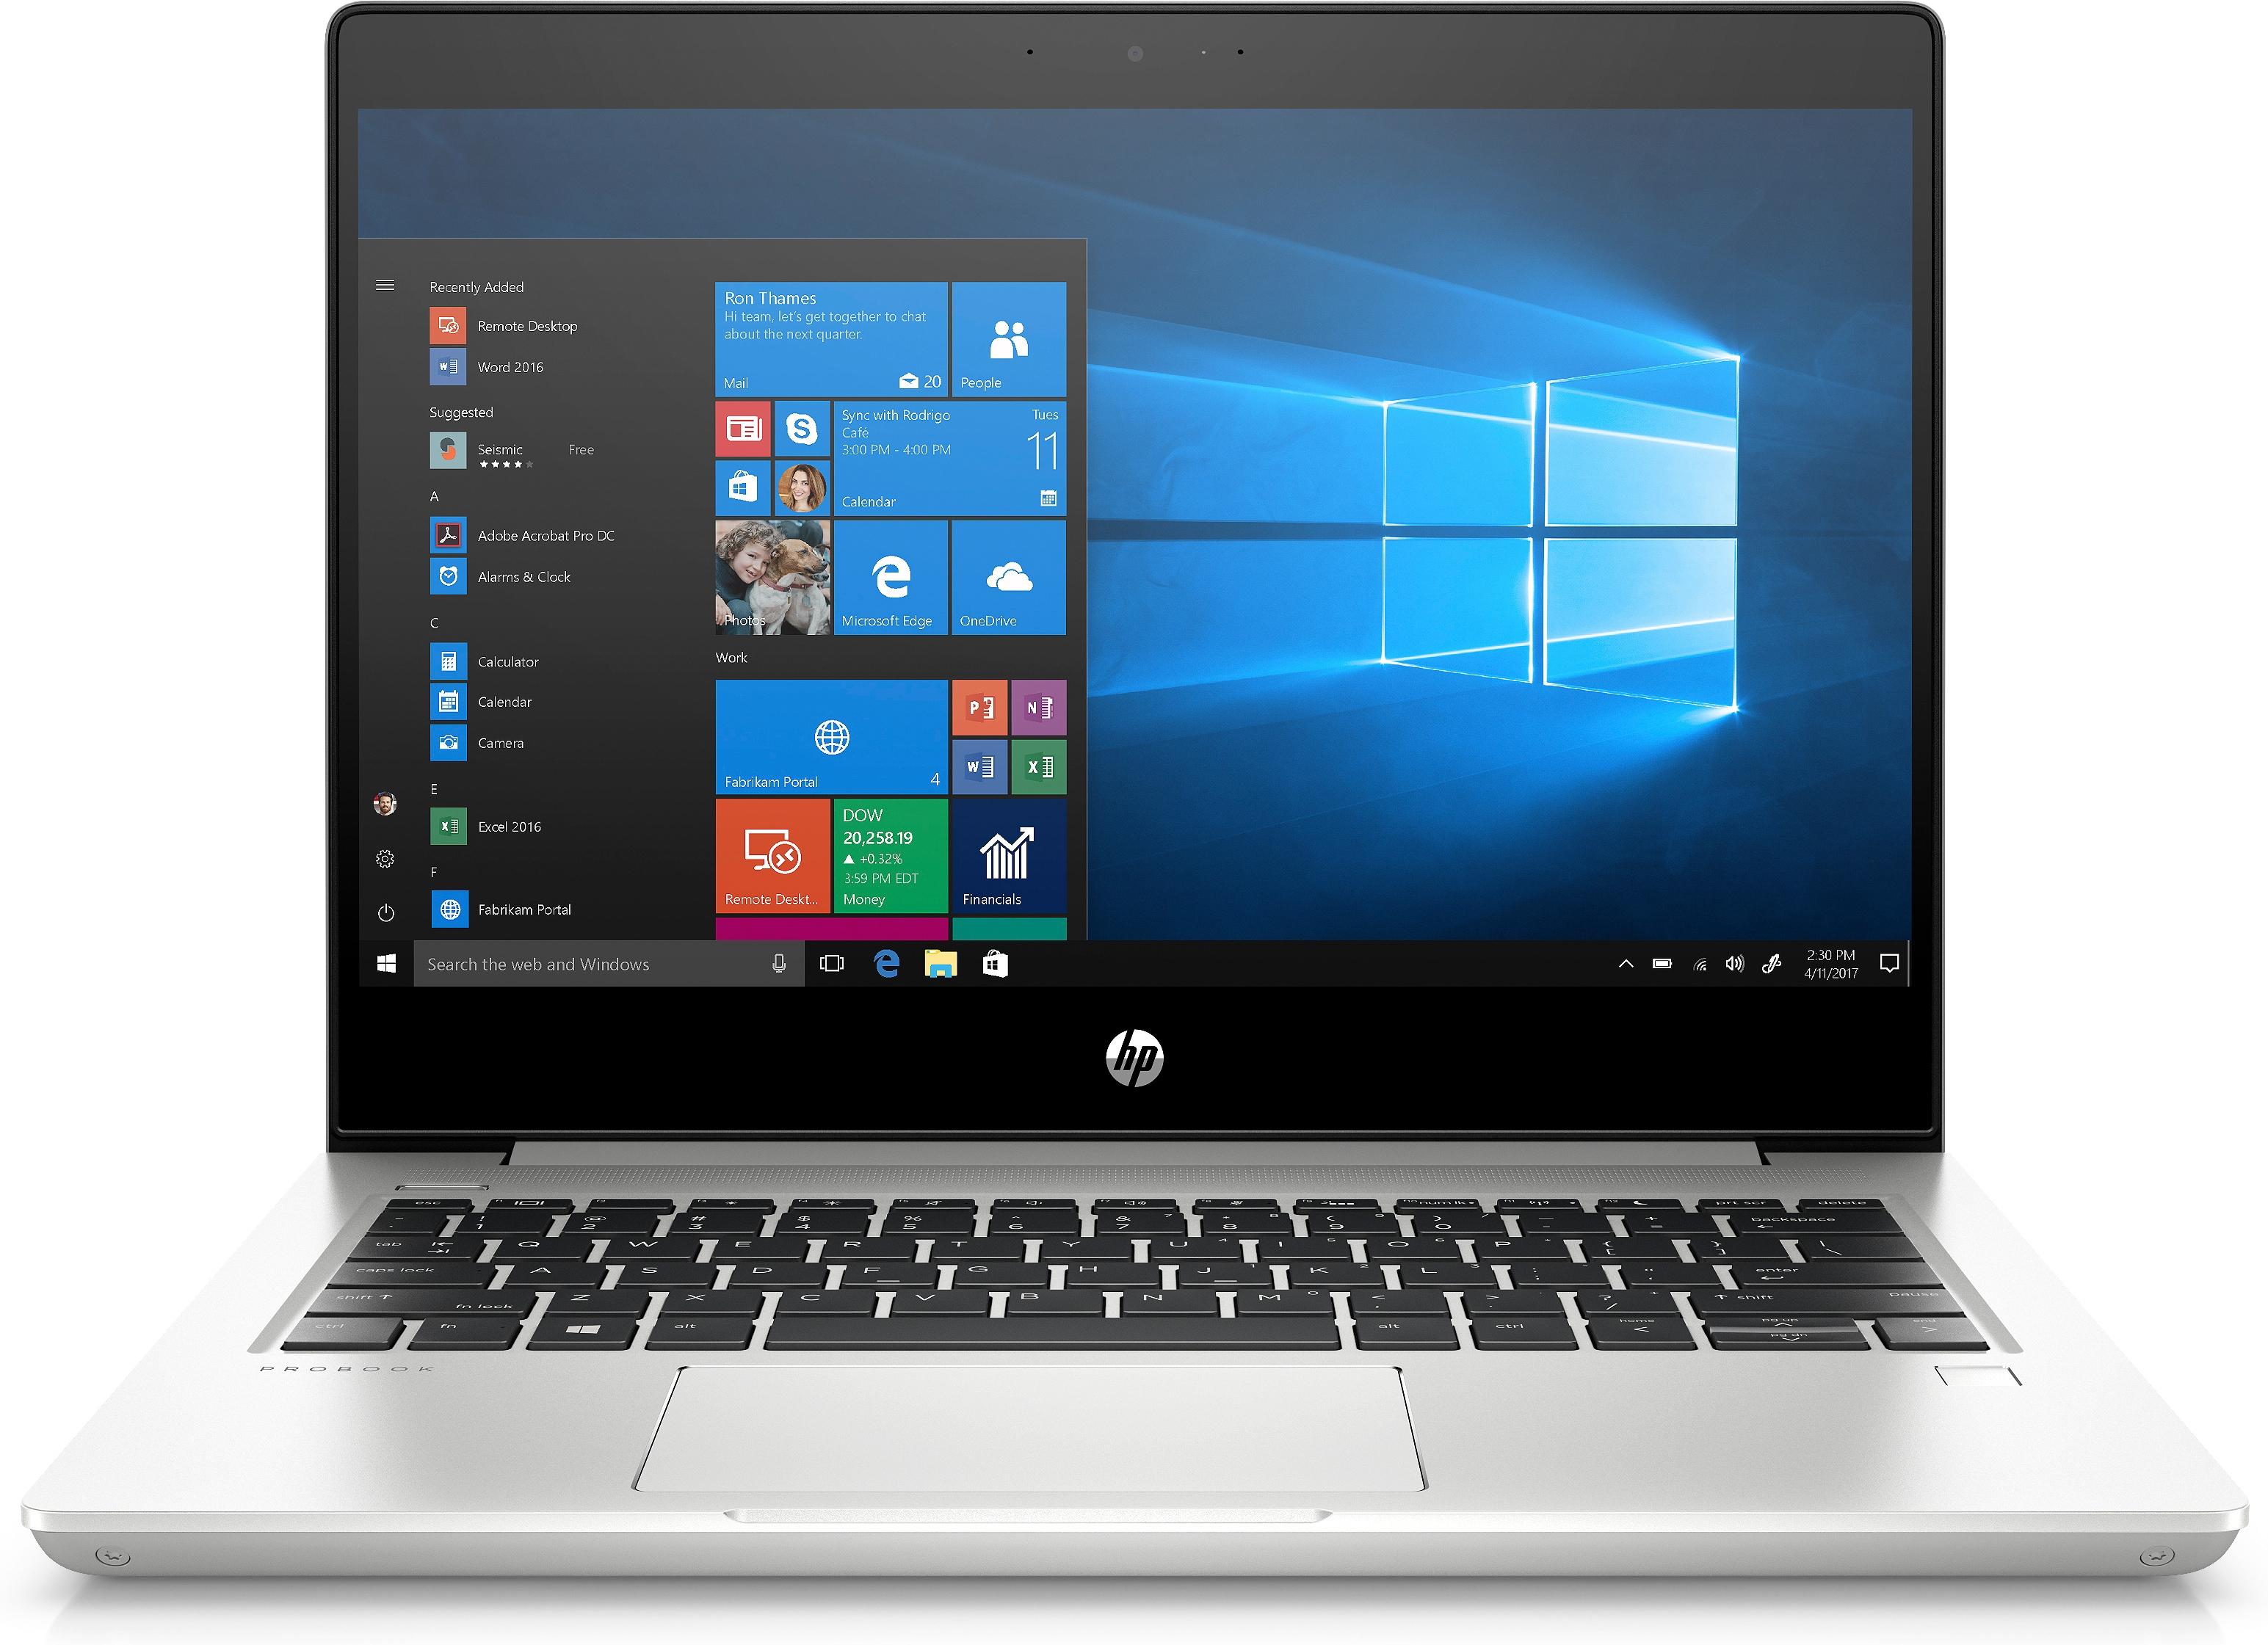 HP ProBook 430 G6 - Intel® Core™ i7 der achten Generation - 1,8 GHz - 33,8 cm (13.3 Zoll) - 1920 x 1080 Pixel - 16 GB - 1256 GB